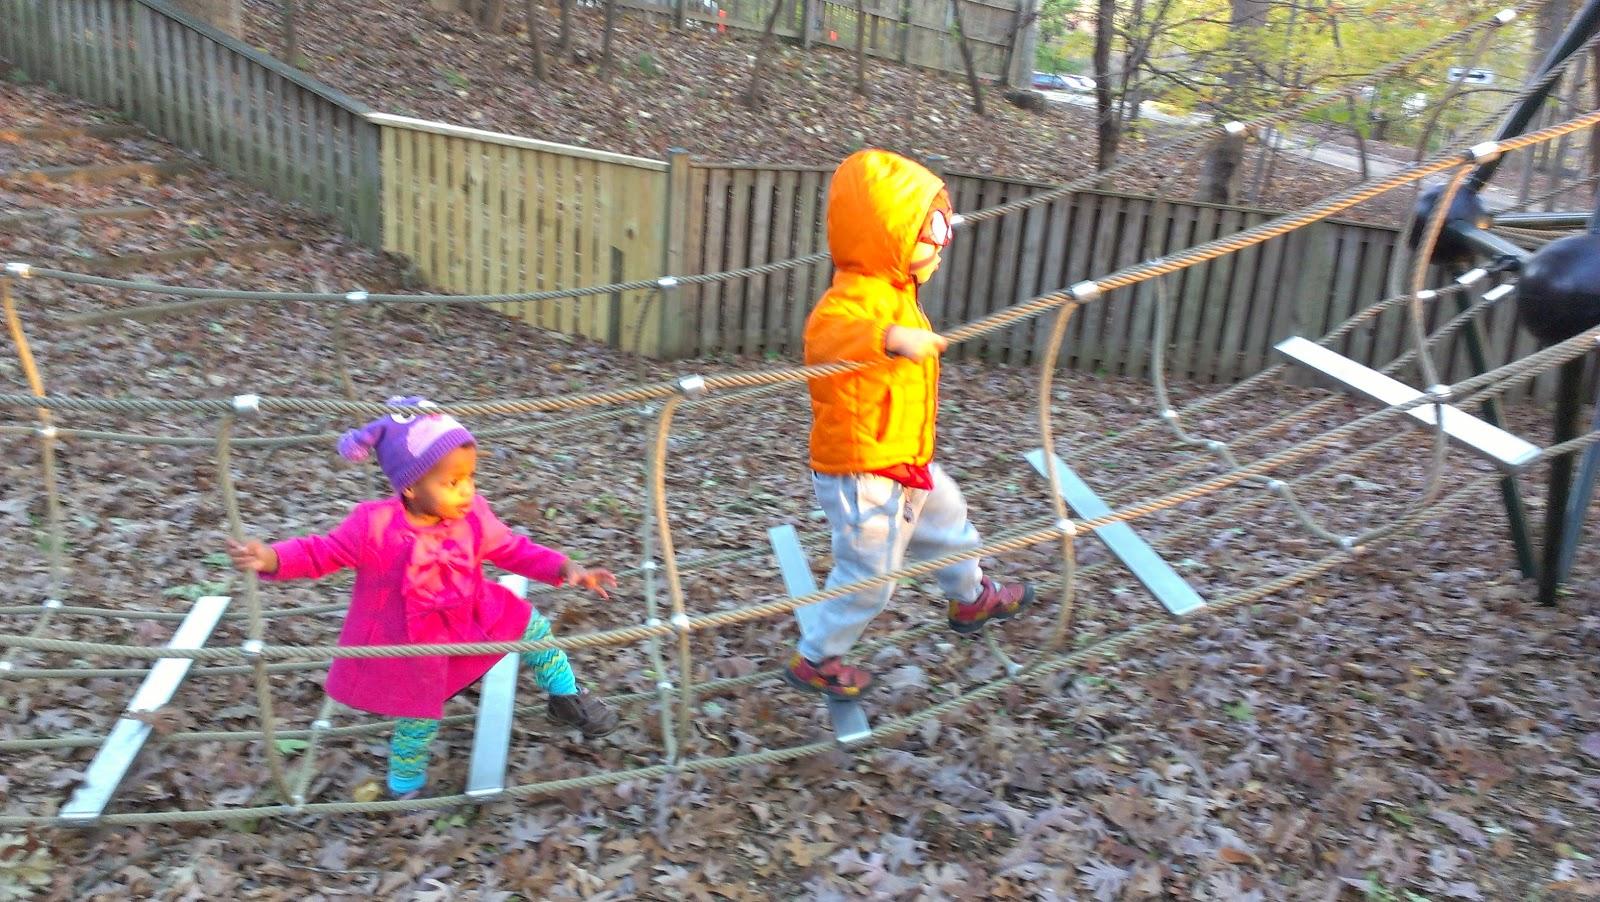 Preschool Playground Preschool playground power!